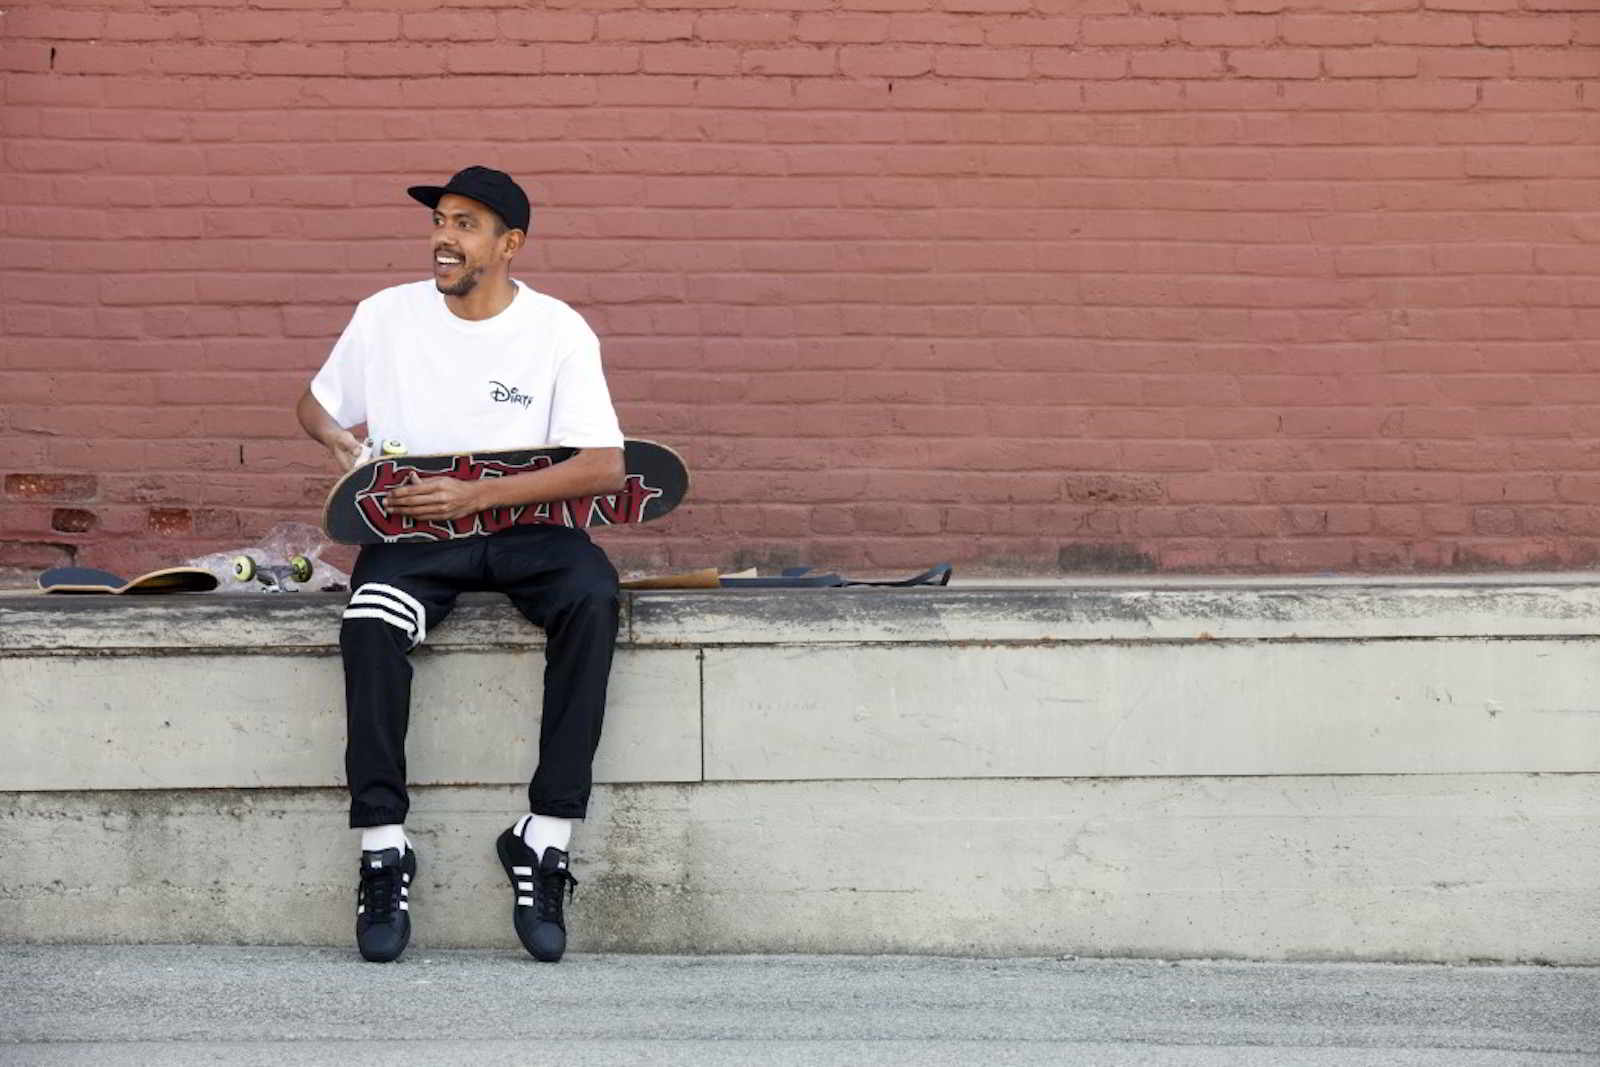 streetwear brasil dgk adidas skateboarding 2016 01 - Estilo dos chicanos influencia Rebel8